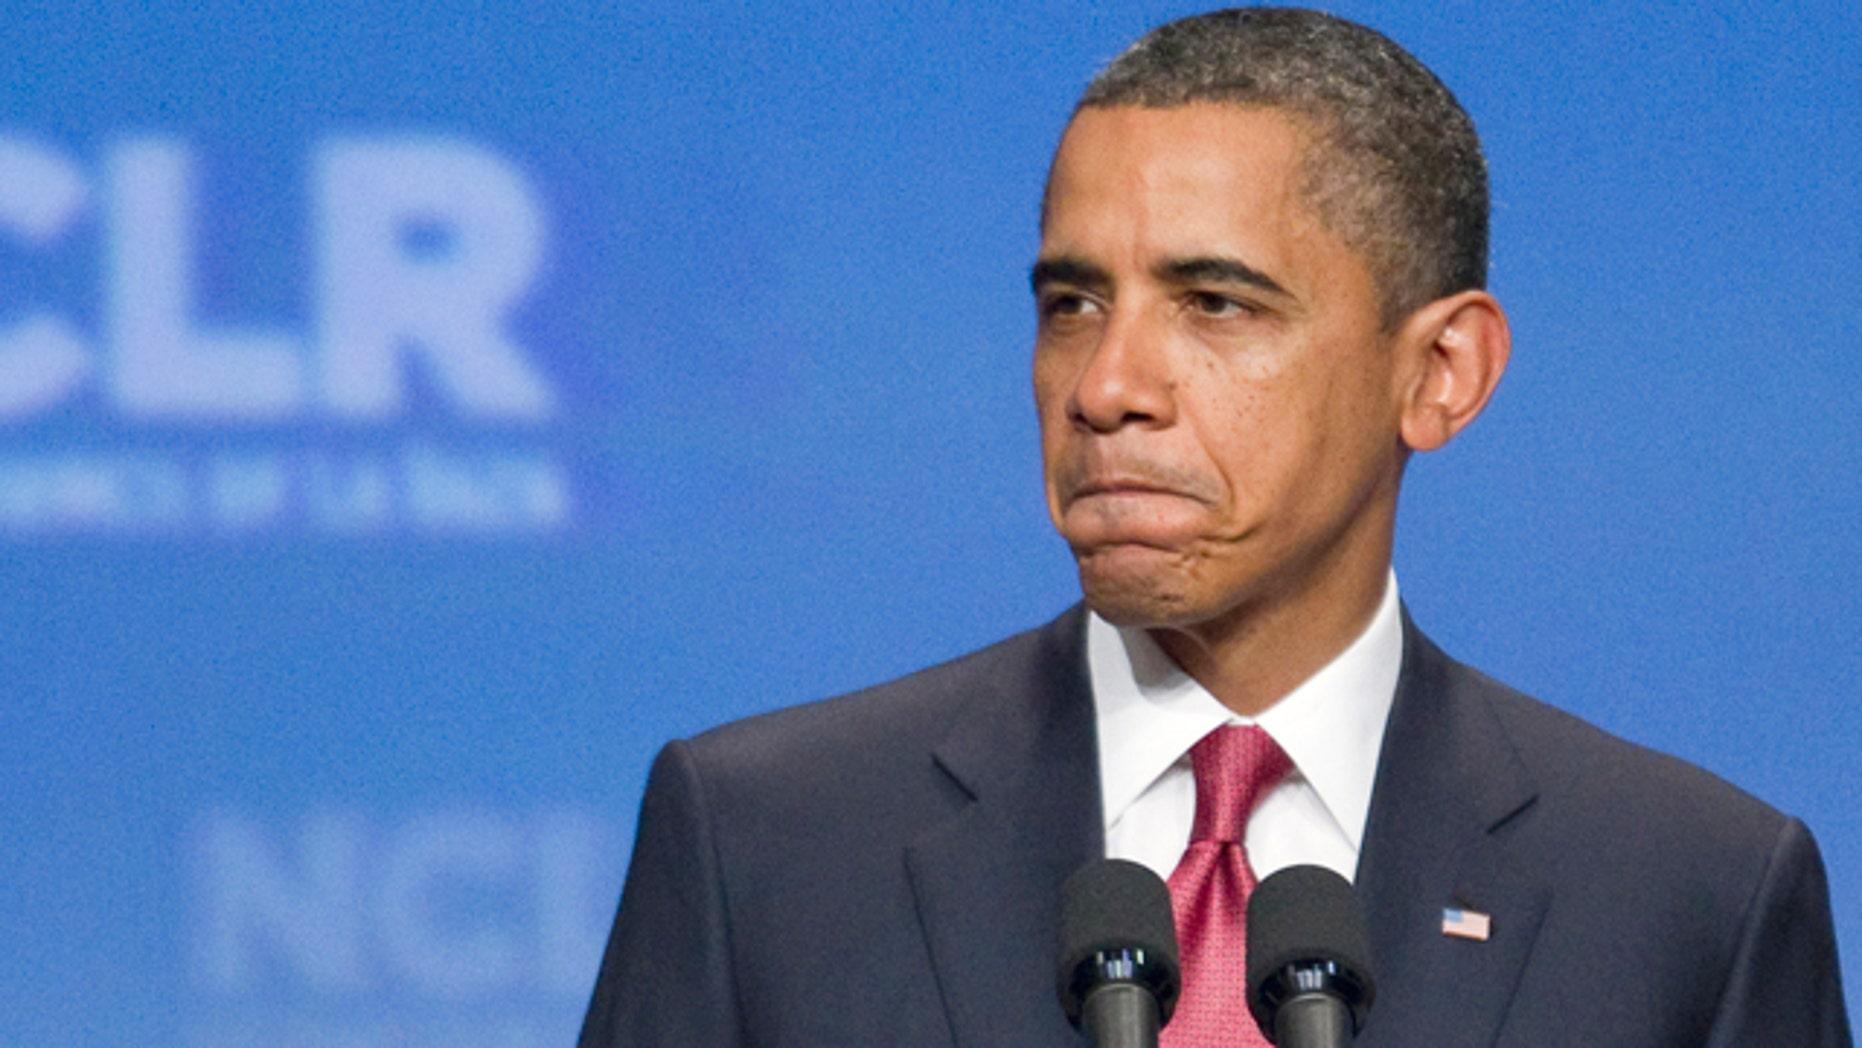 July 25, 2011: President Obama speaks to the National Council of La Raza.